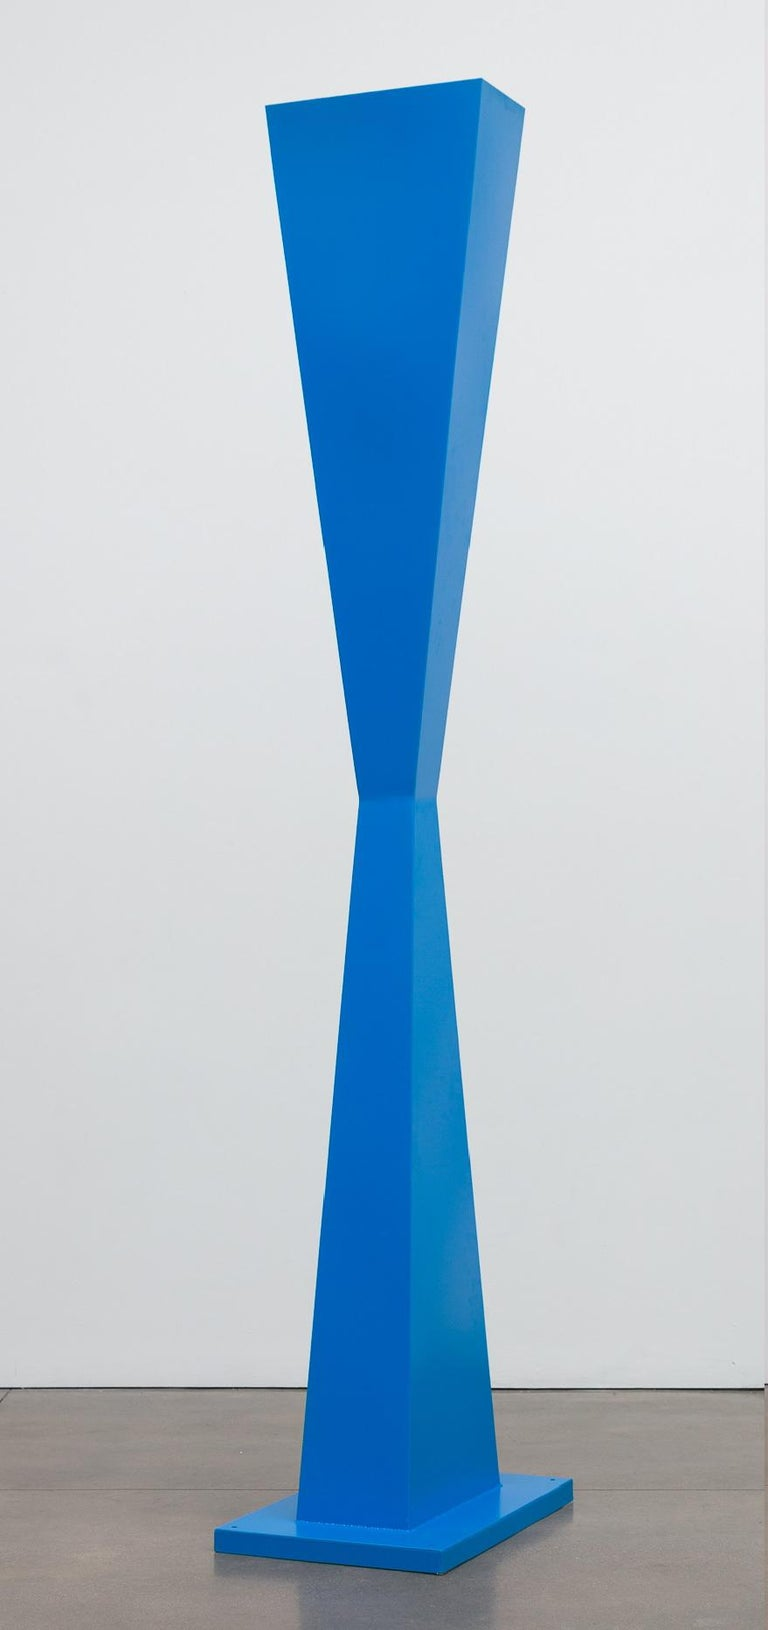 Infinite Pair - Sculpture by Stephen Shachtman